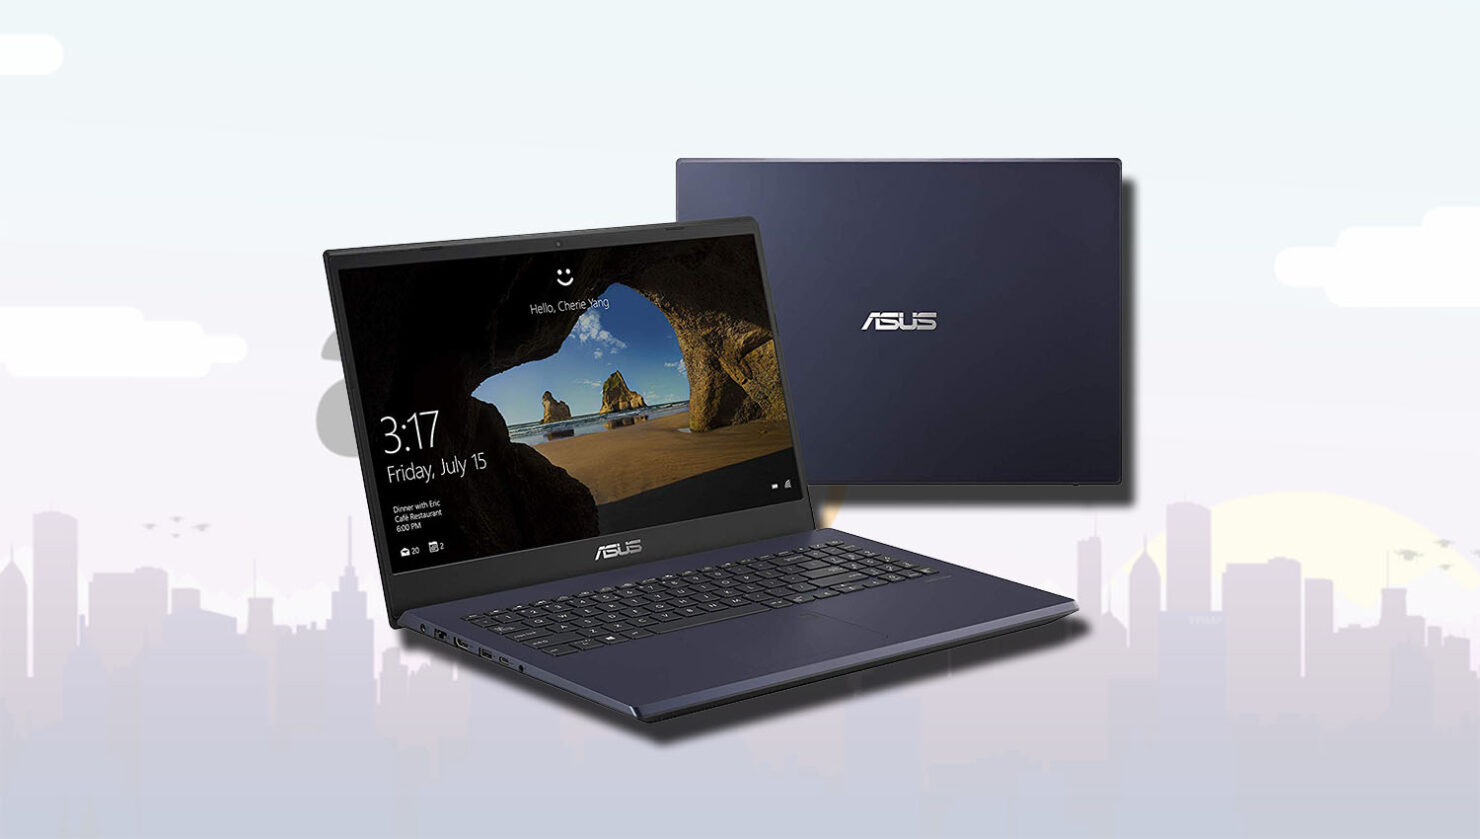 ASUS Vivobook K571 $899 black Friday